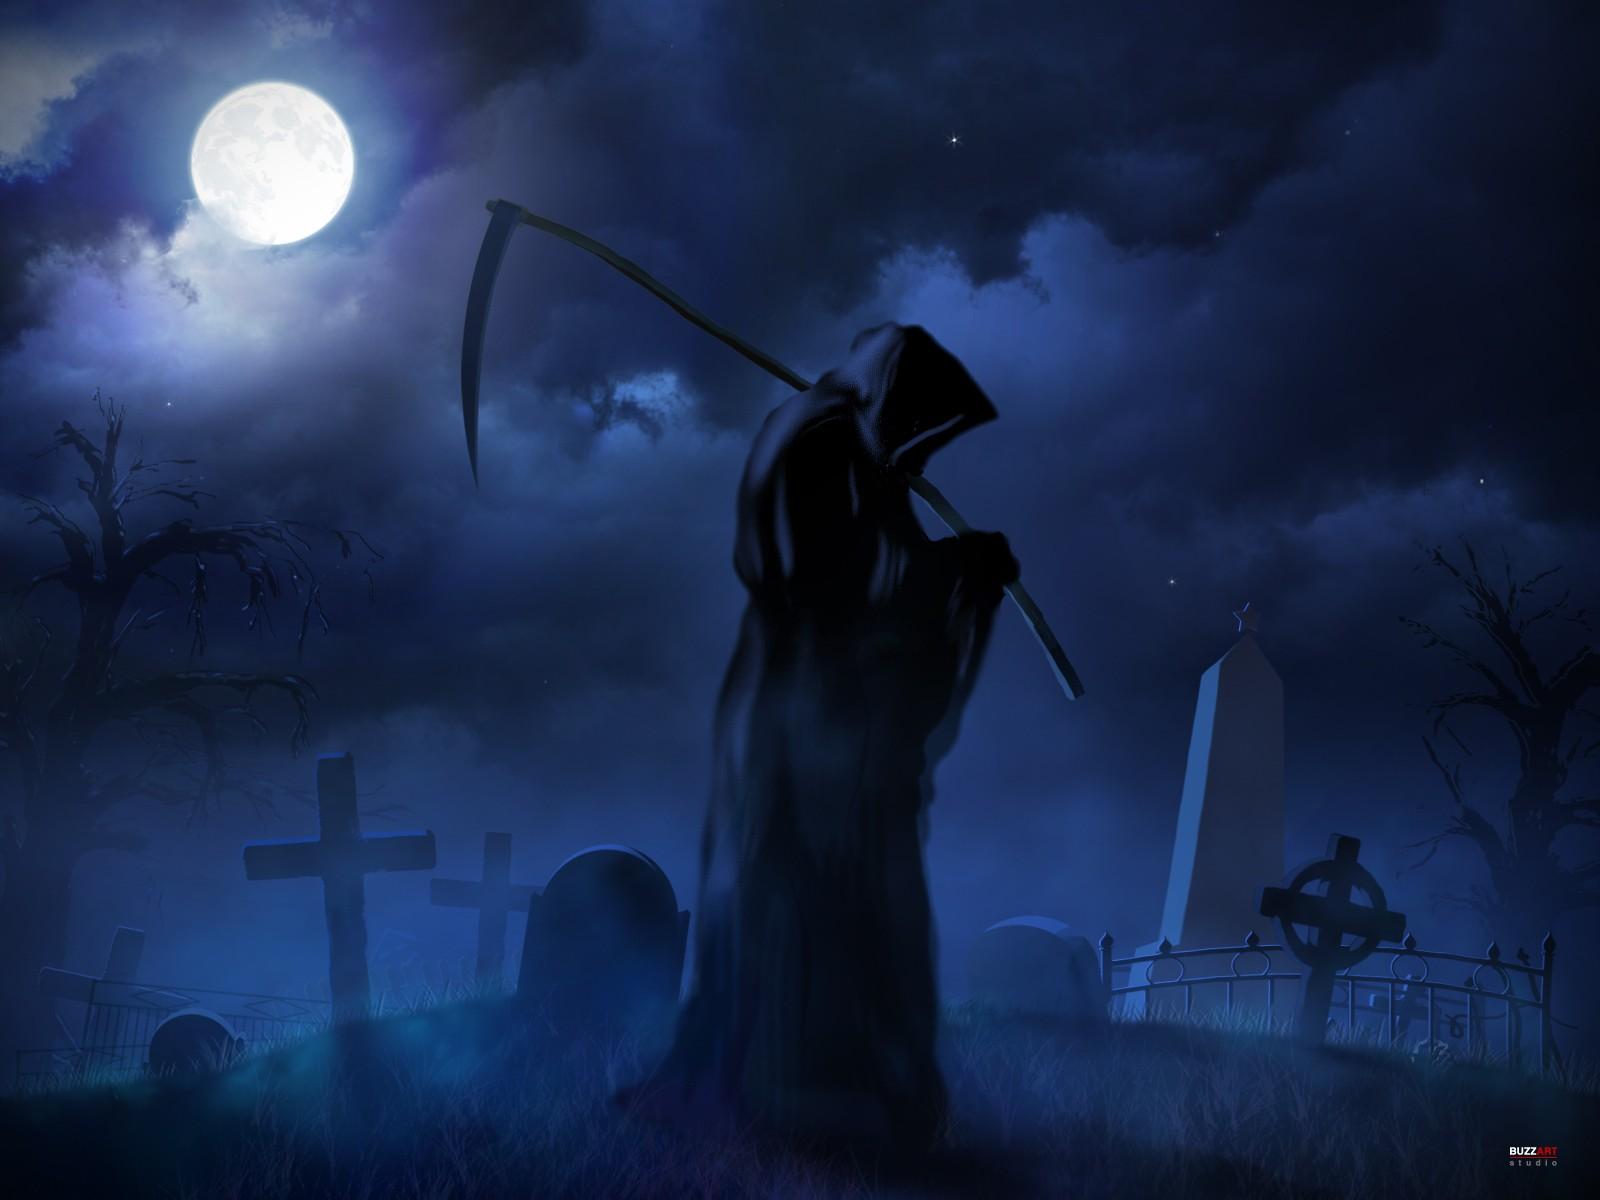 grim reaper Wallpaper Background 20442 1600x1200